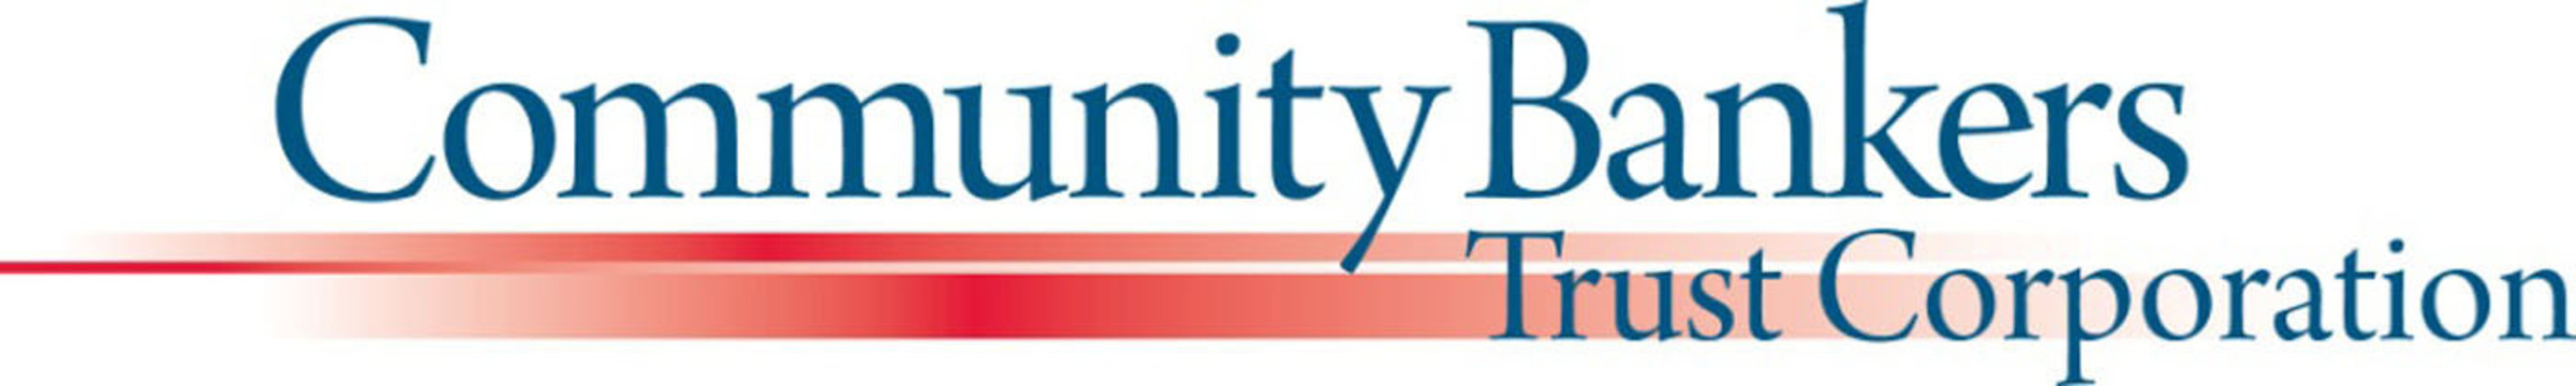 Community Bankers Trust Corporation logo.